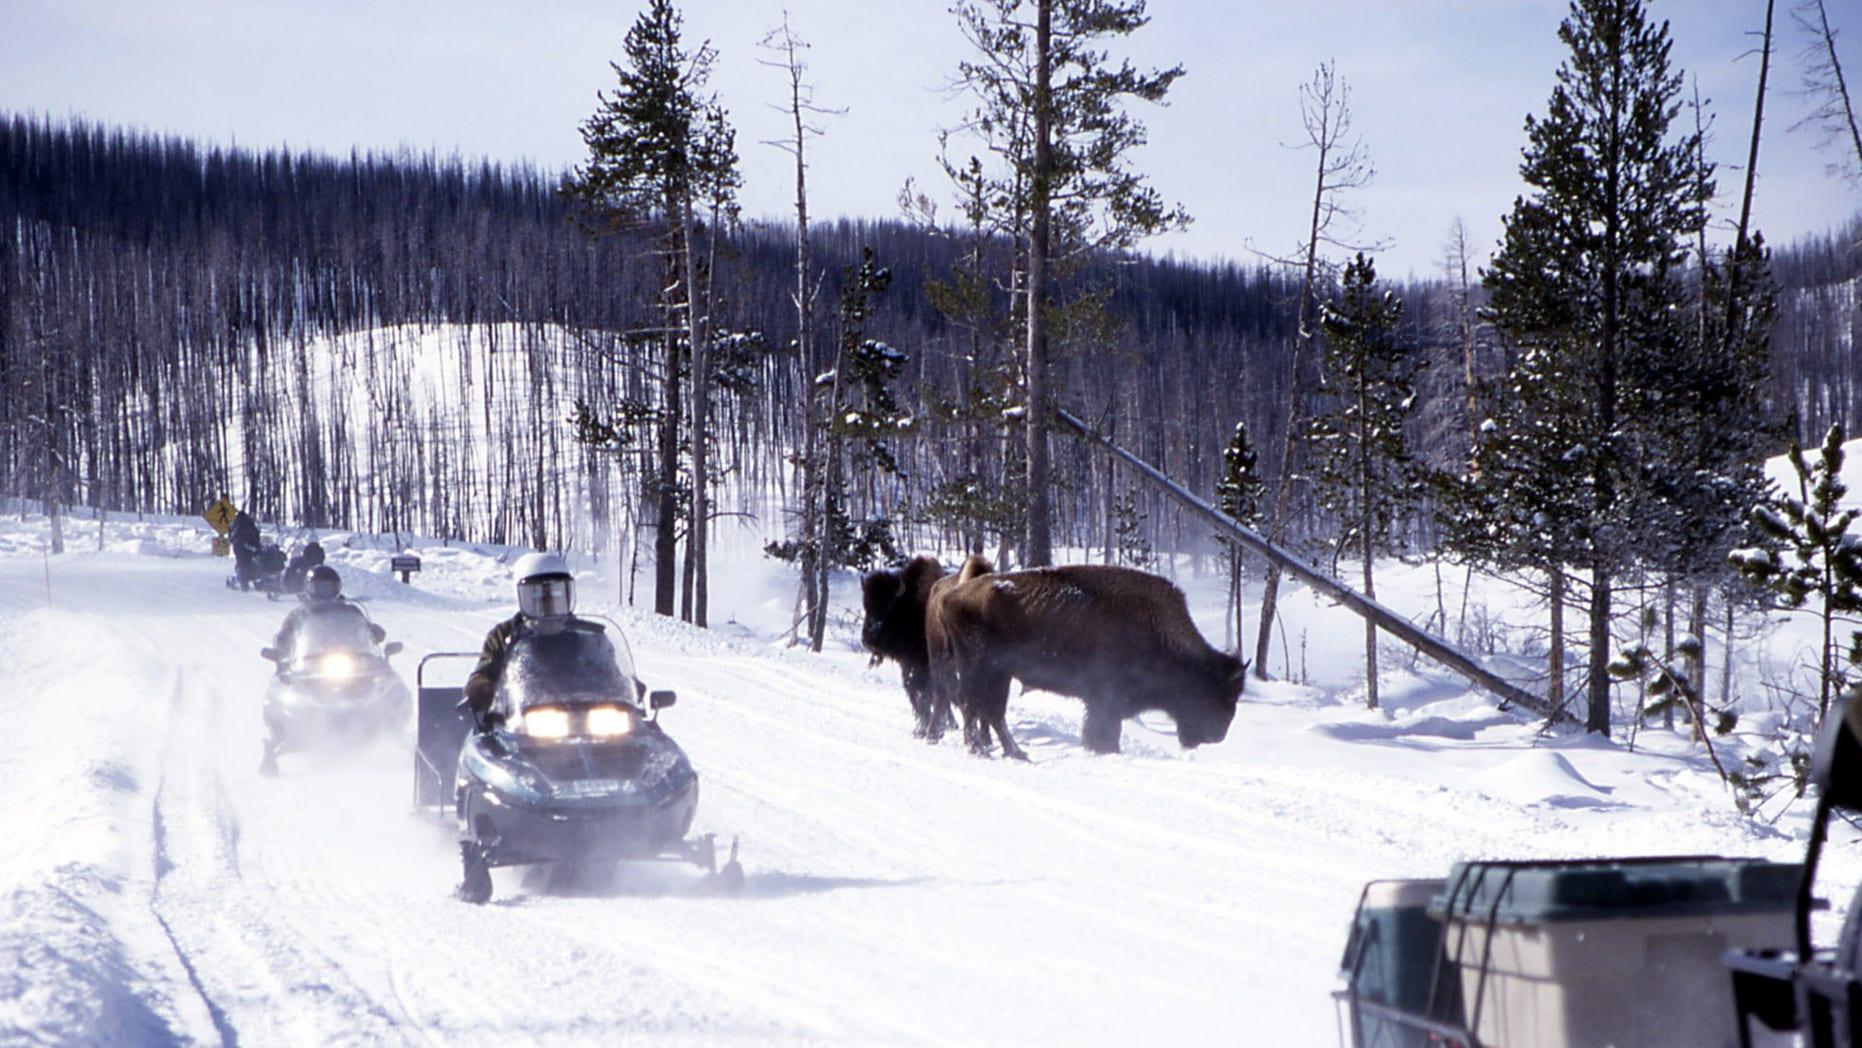 Snowmobiles passing bison near Roaring Mountain in Yellowstone.